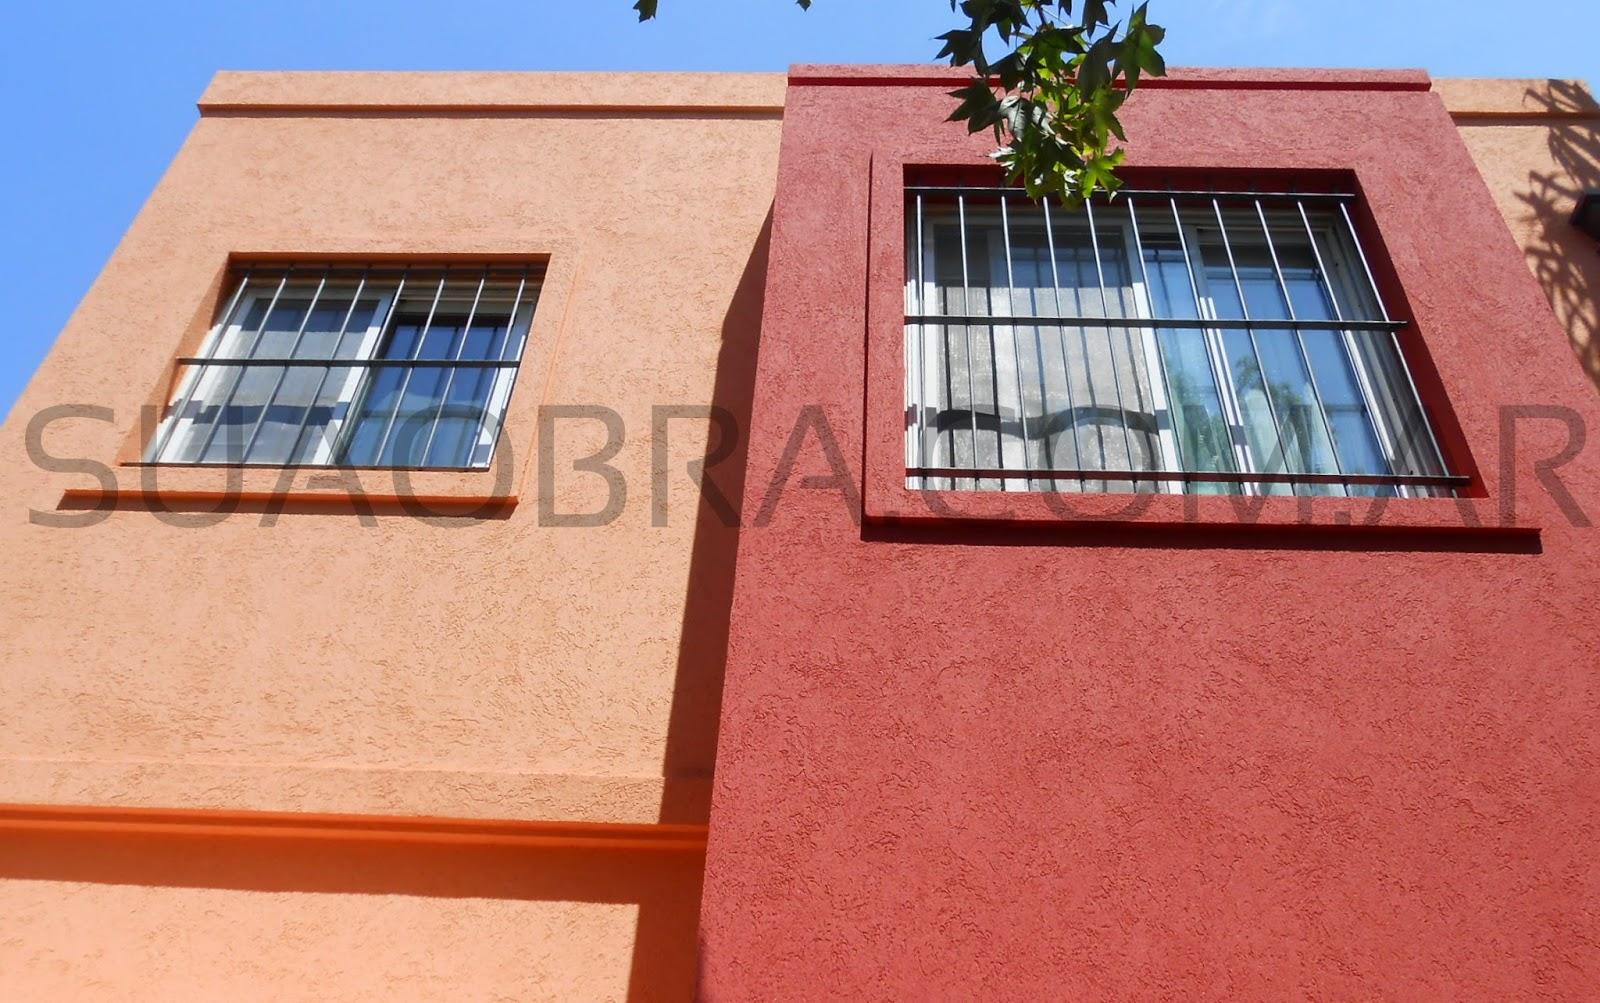 Combinacion de colores tarquini revestimiento plastico tarquini para paredes san isidro - Revestimientos de exteriores ...